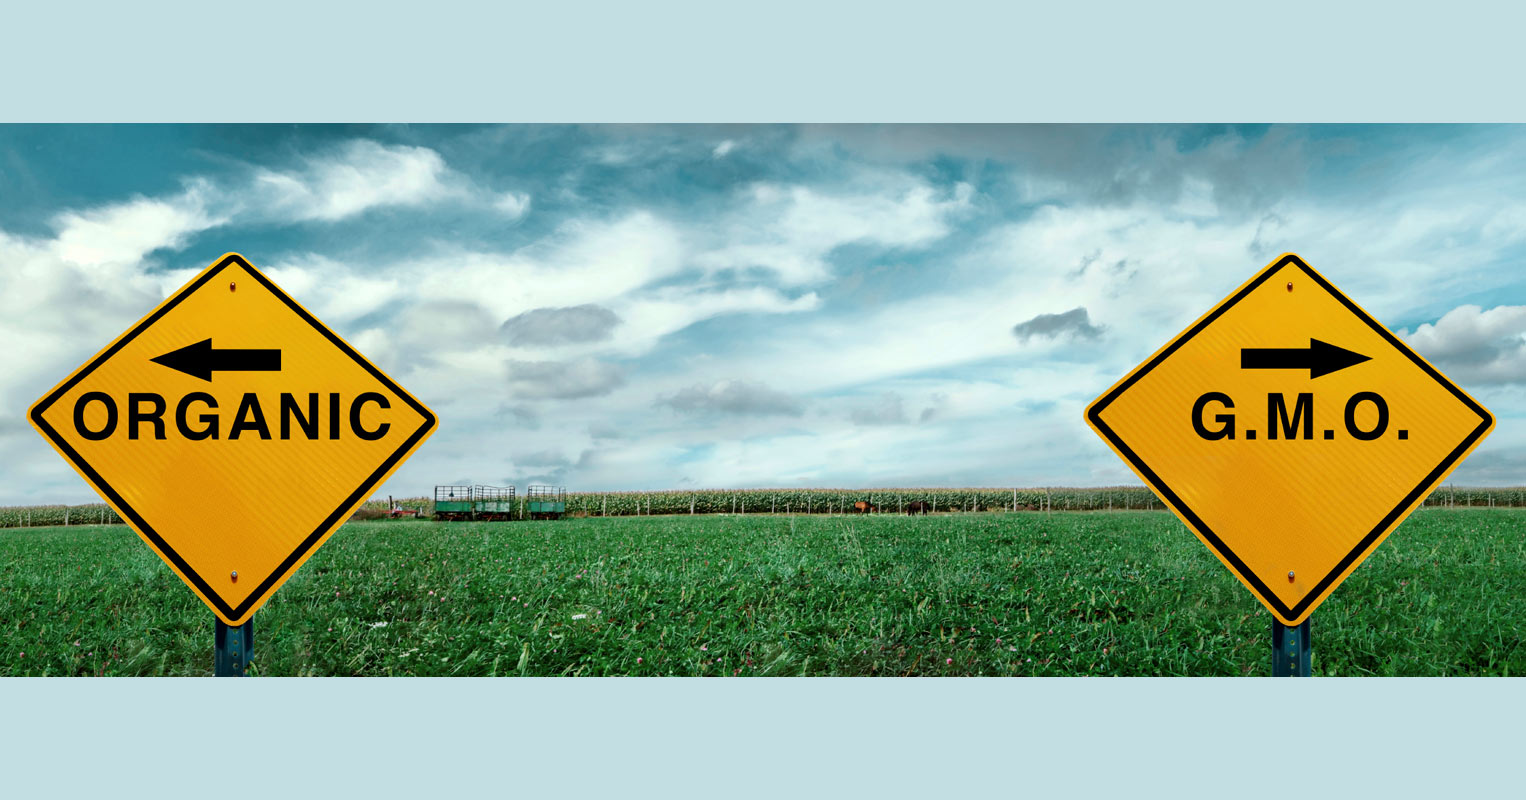 GMO vs Organic warning signs in field